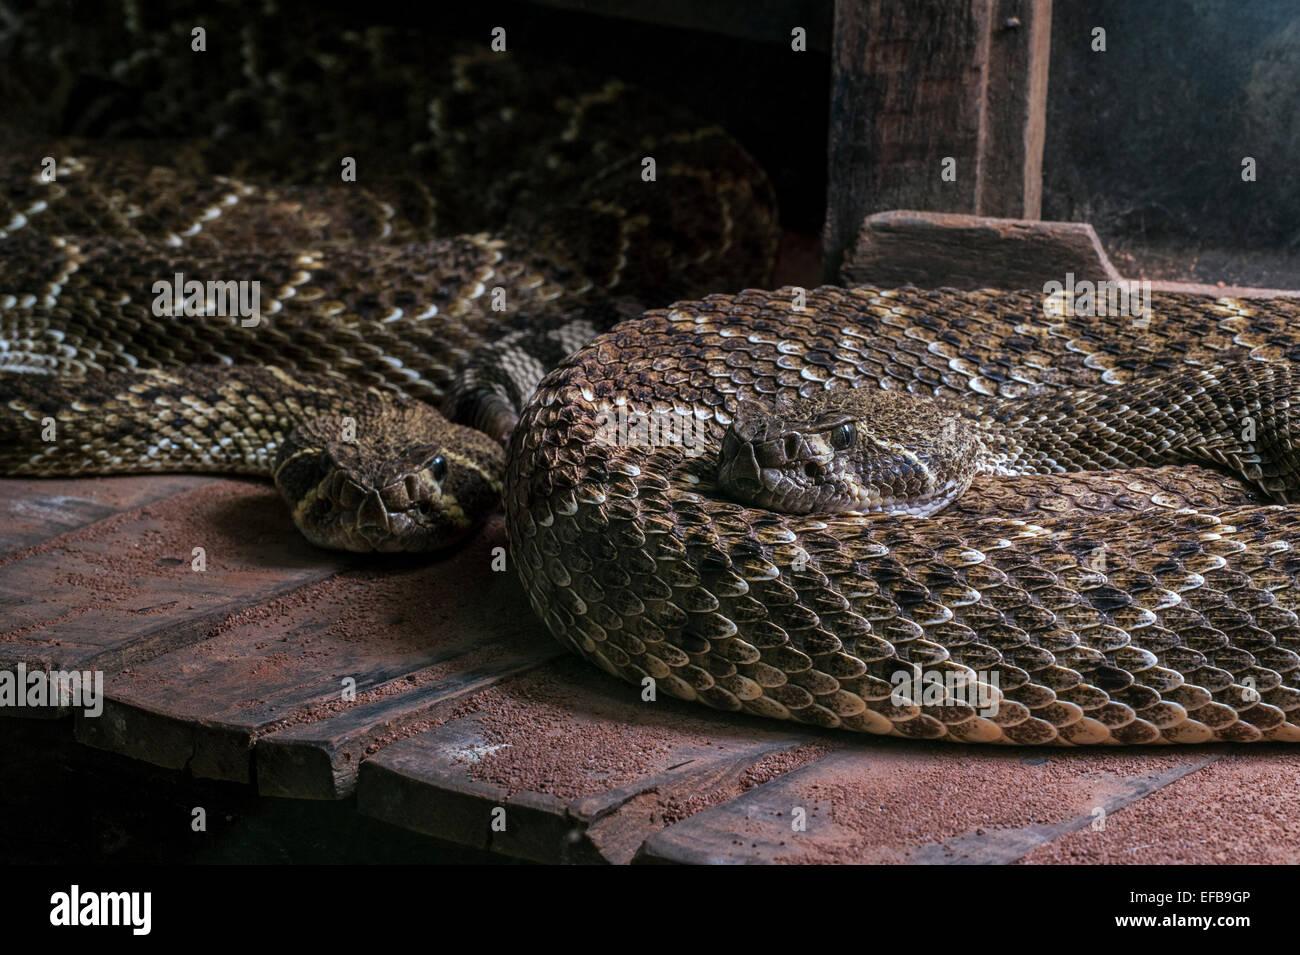 Two Western diamondback rattlesnakes / Texas diamond-back rattlesnake (Crotalus atrox) curled up in building, native Stock Photo